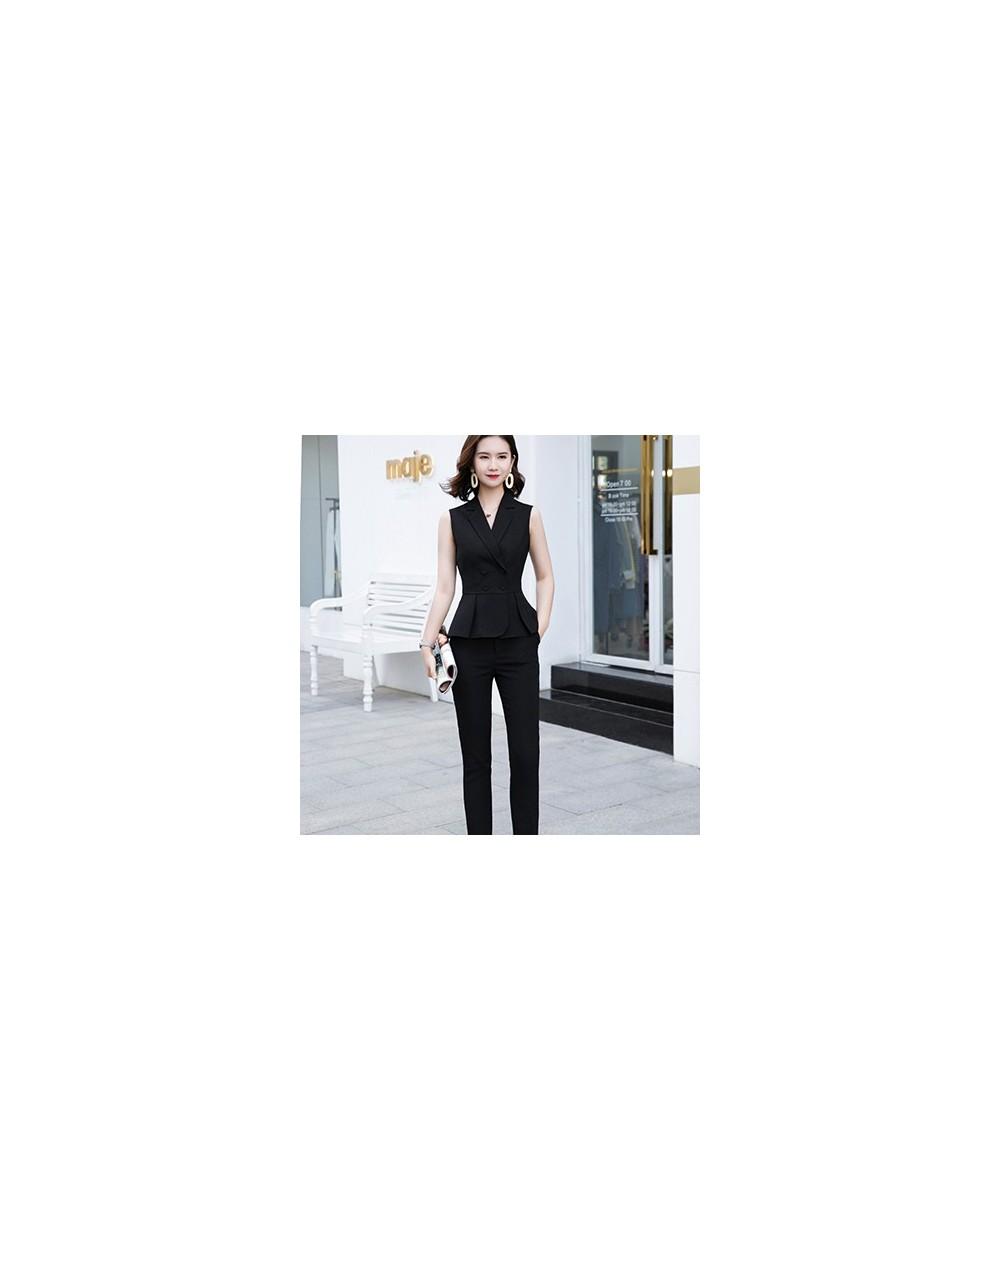 Summer Wear Short Sleeve Women 2 Piece Set Fashion Pant Suit Size S-4XL Slim Vest Sleeveless Jacket Blazer With Pant Red - B...